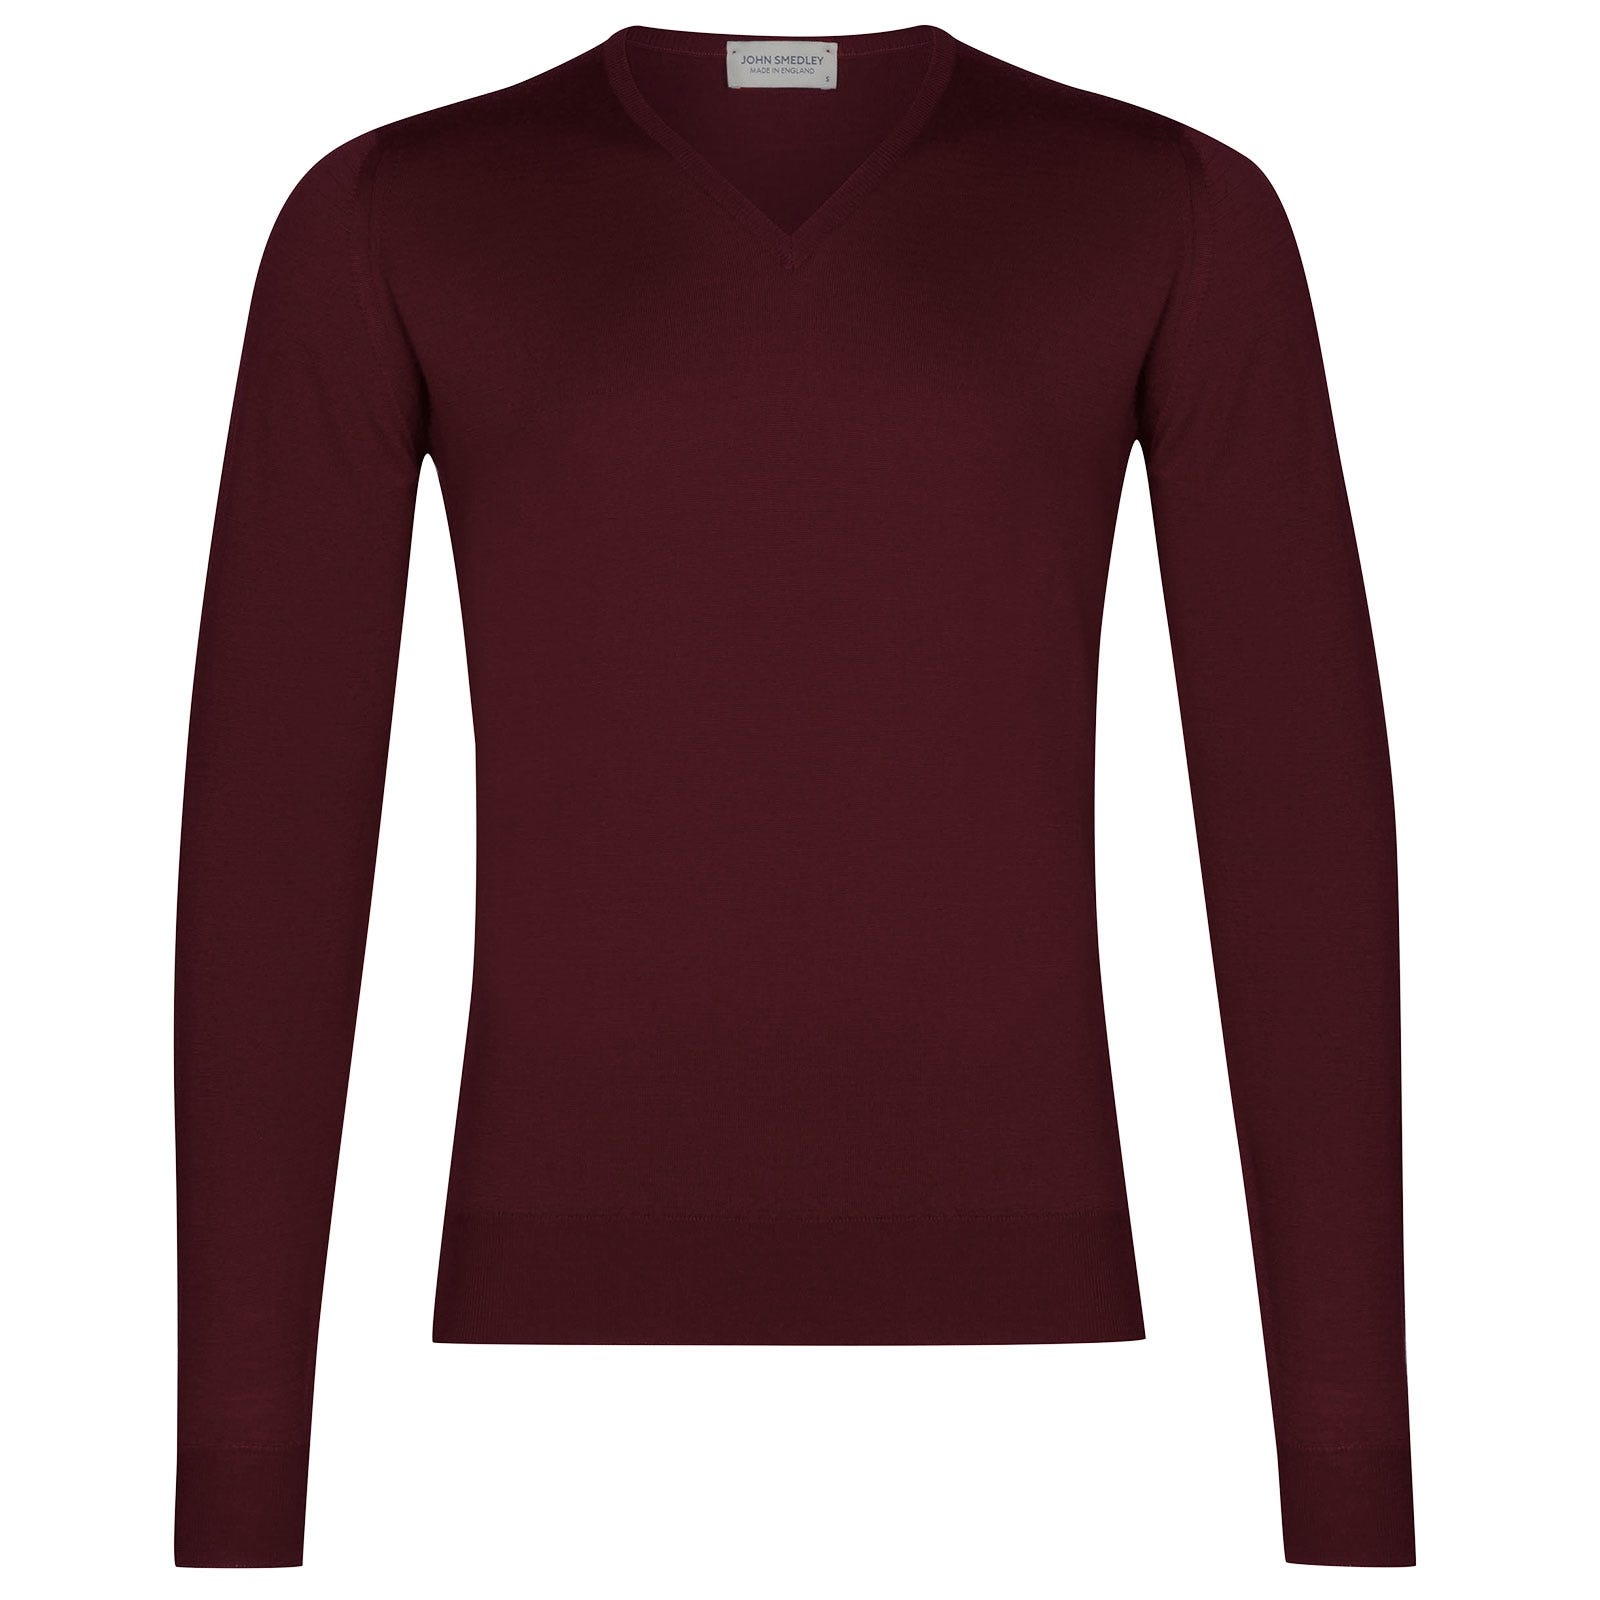 John Smedley Blenheim Merino Wool Pullover in Bordeaux-XL